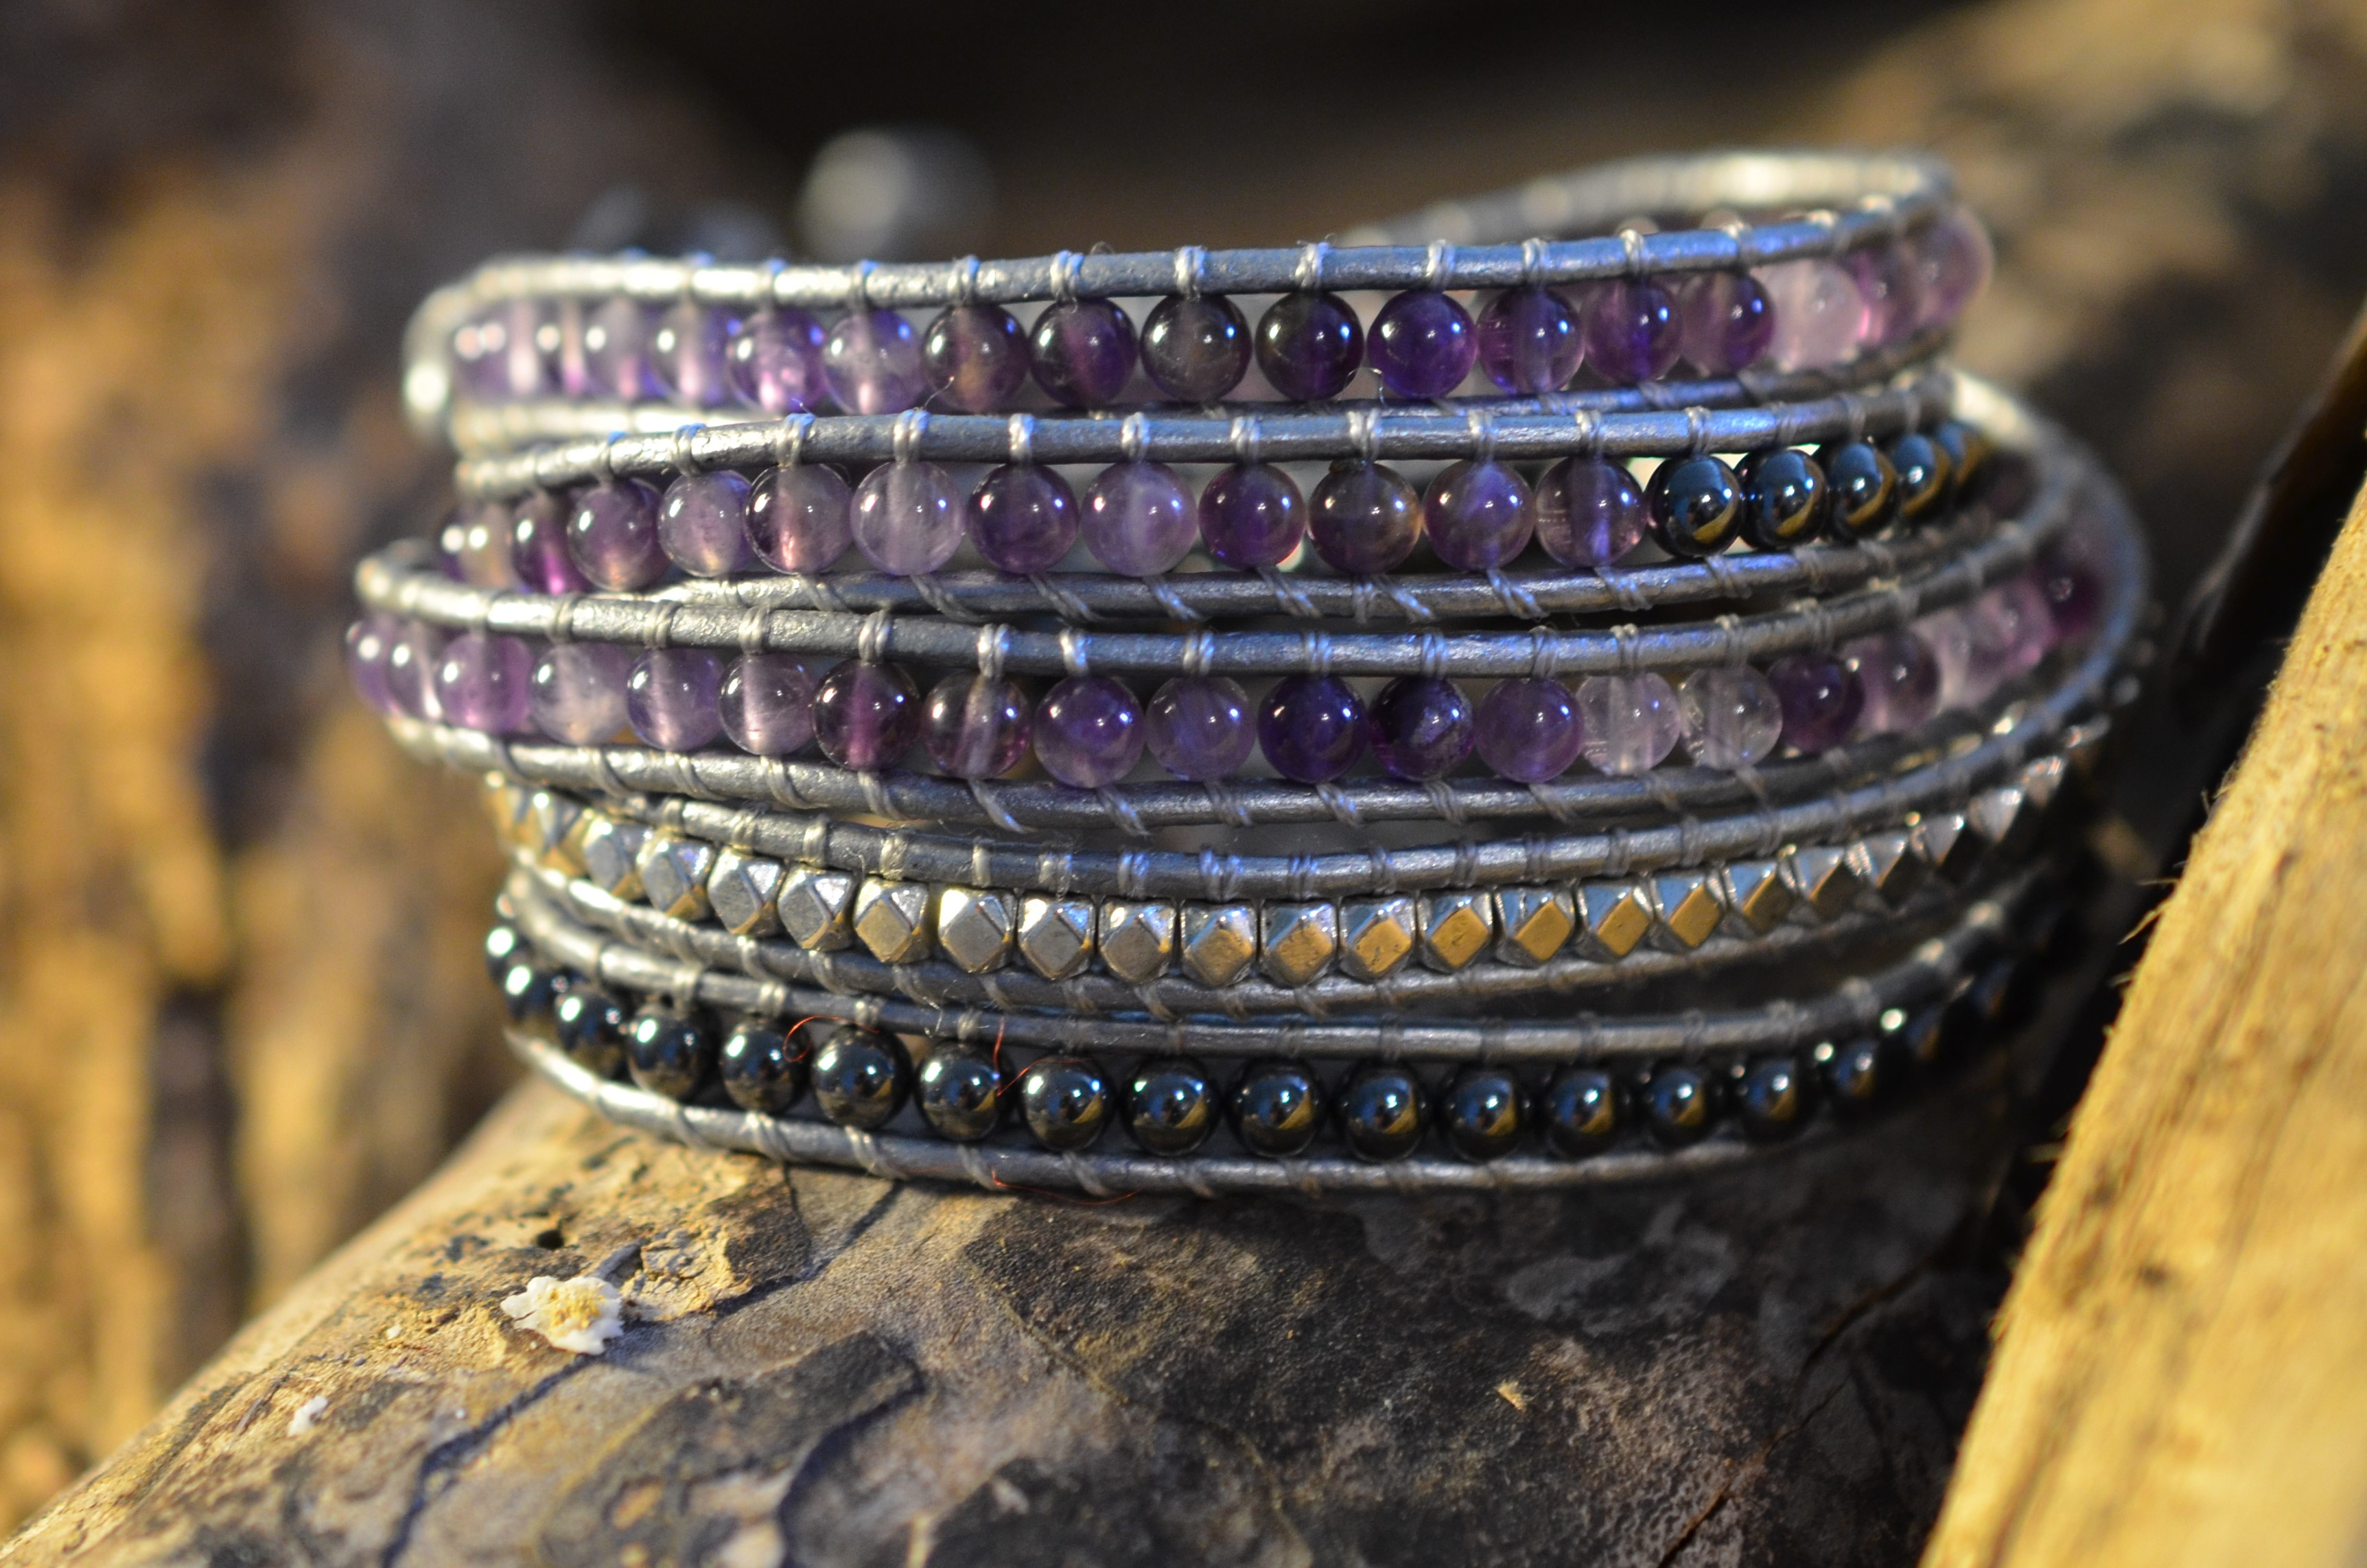 stone-era-natural-stone-bracelet-manon-tremblay-ottawa-amethyst-hematite-wrap-leather